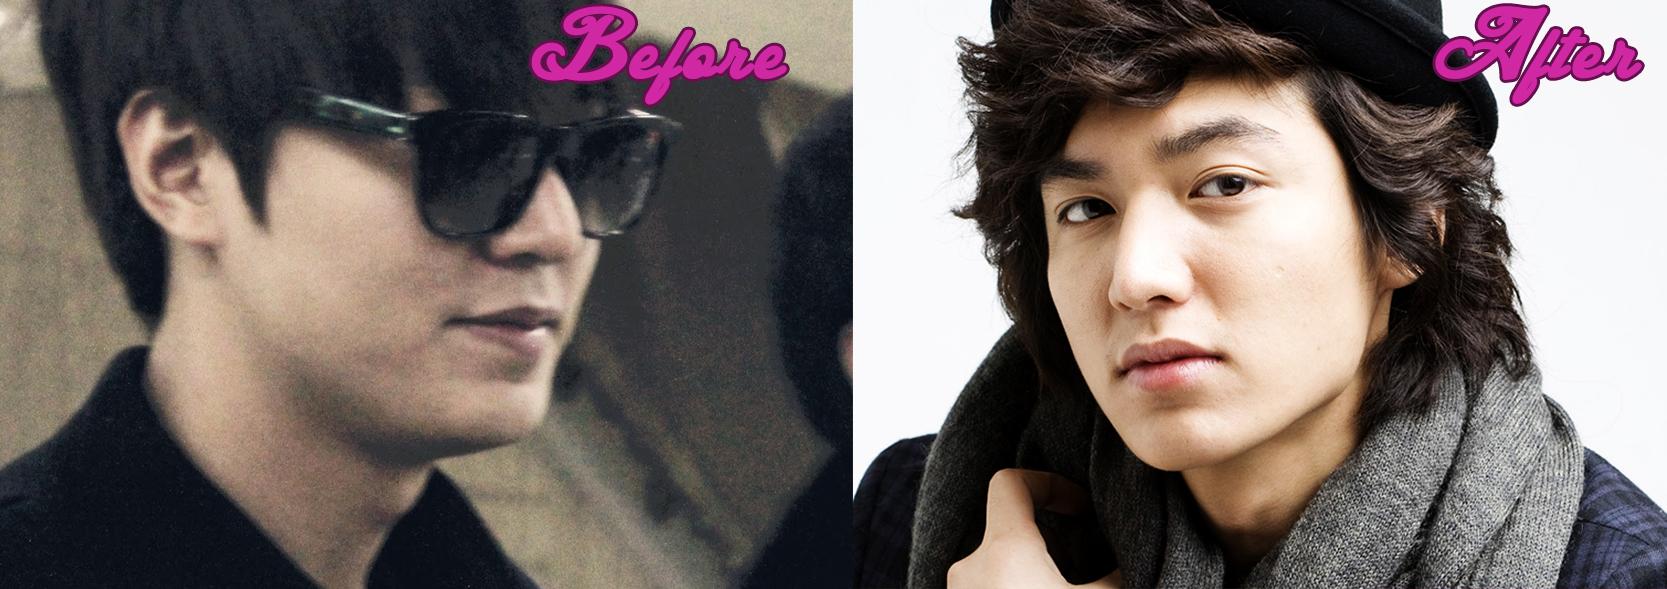 Lee min ho plastic surgery learn more about lee min ho surgery